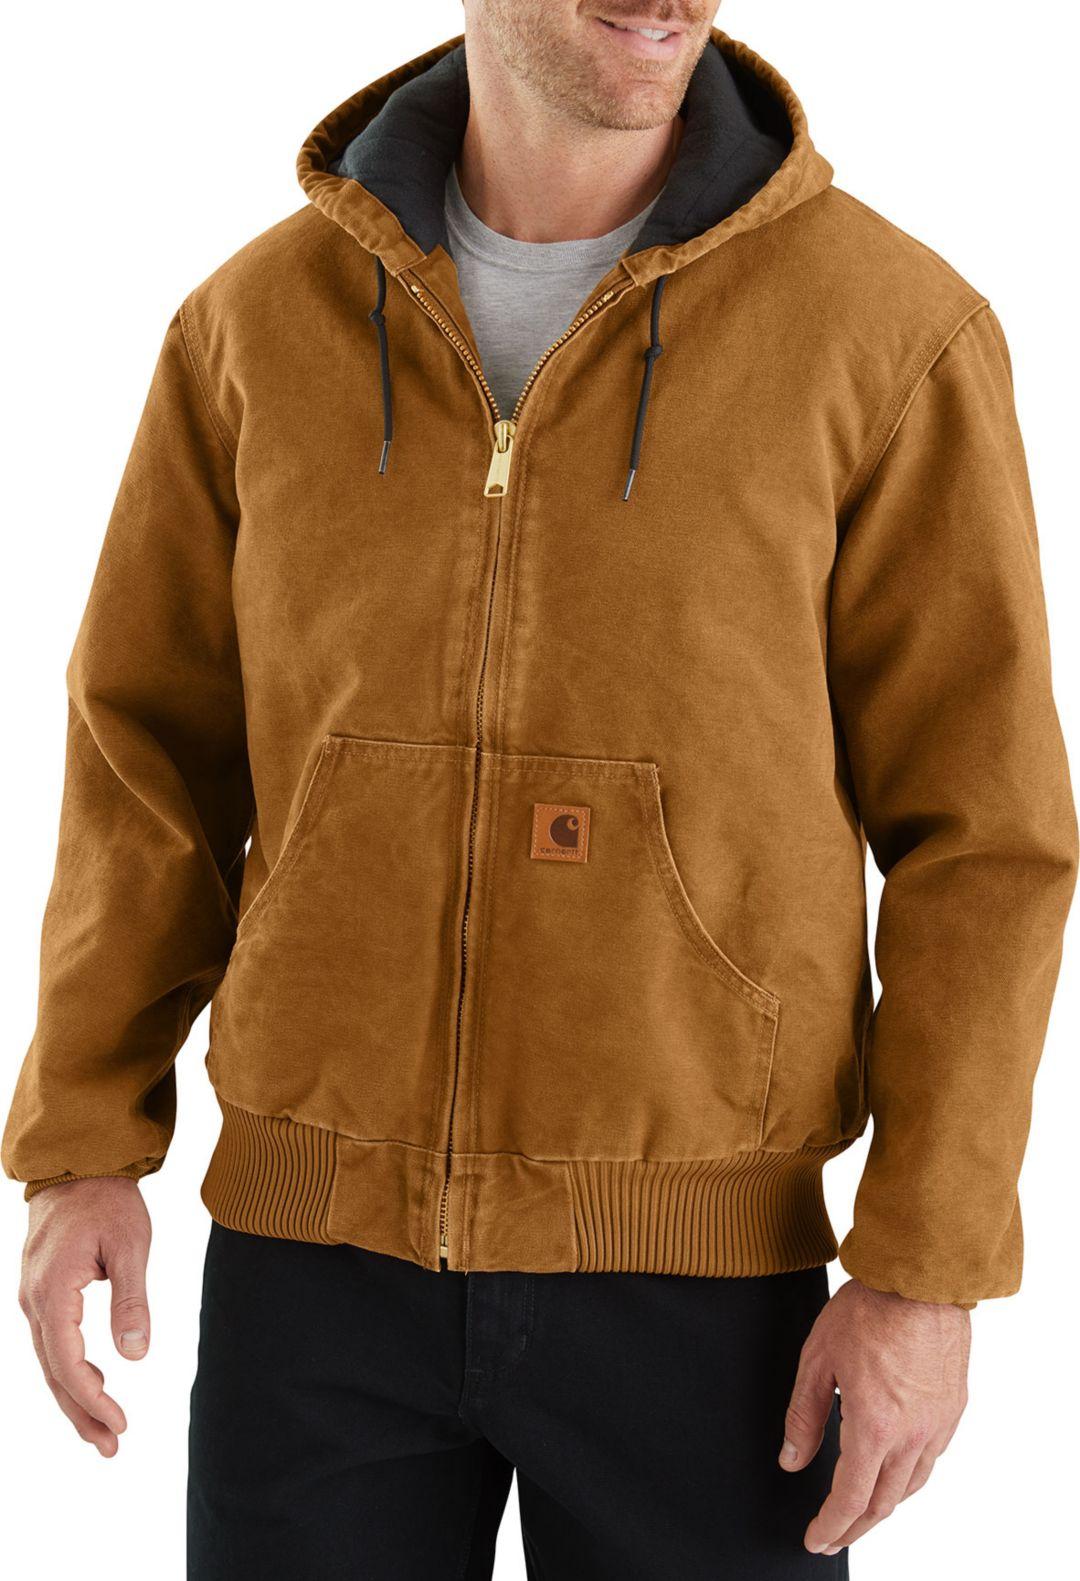 25839e5b566 Carhartt Men's Sandstone Active Lined Jacket. noImageFound. Previous